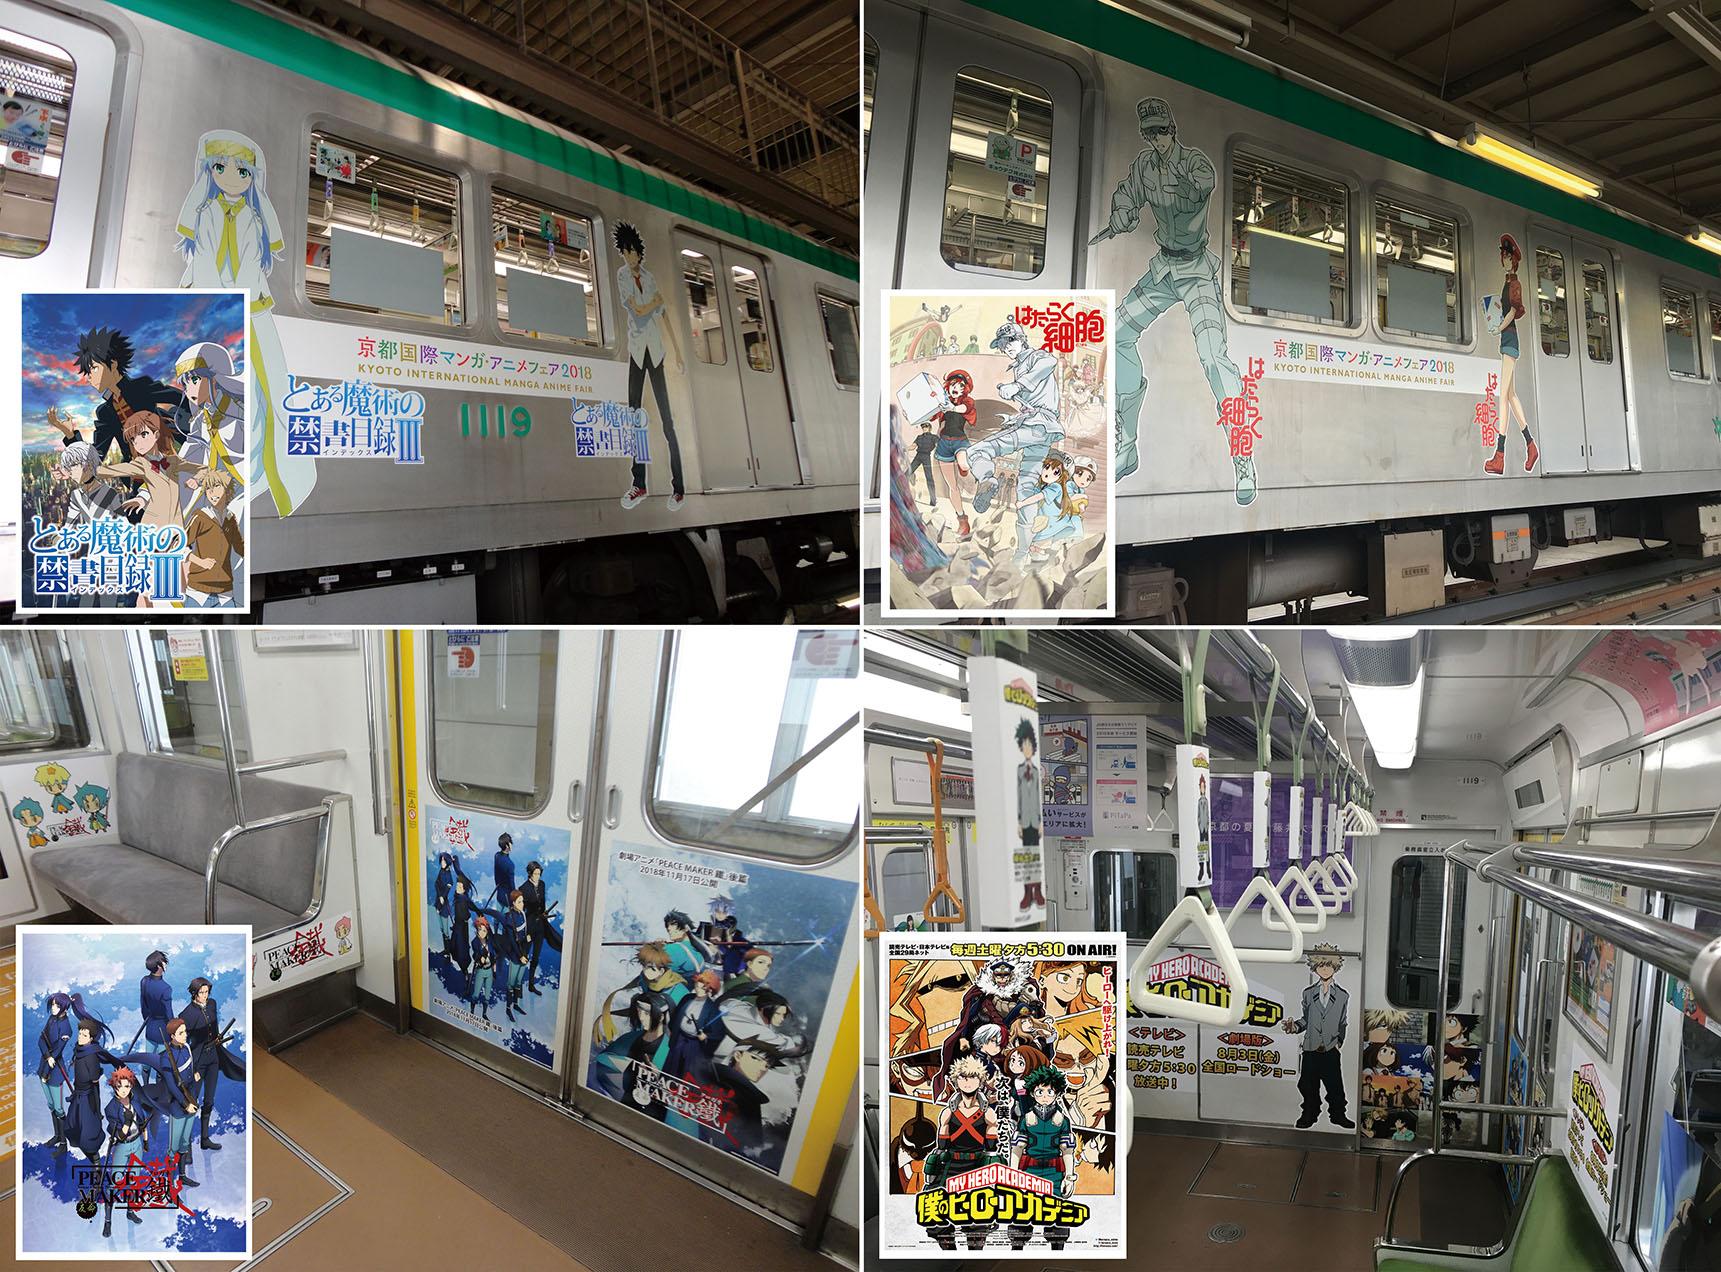 20180801【Press News】『京都国際マンガ・アニメフェア2018』8月1日(水)から「京まふ号」運行開始!